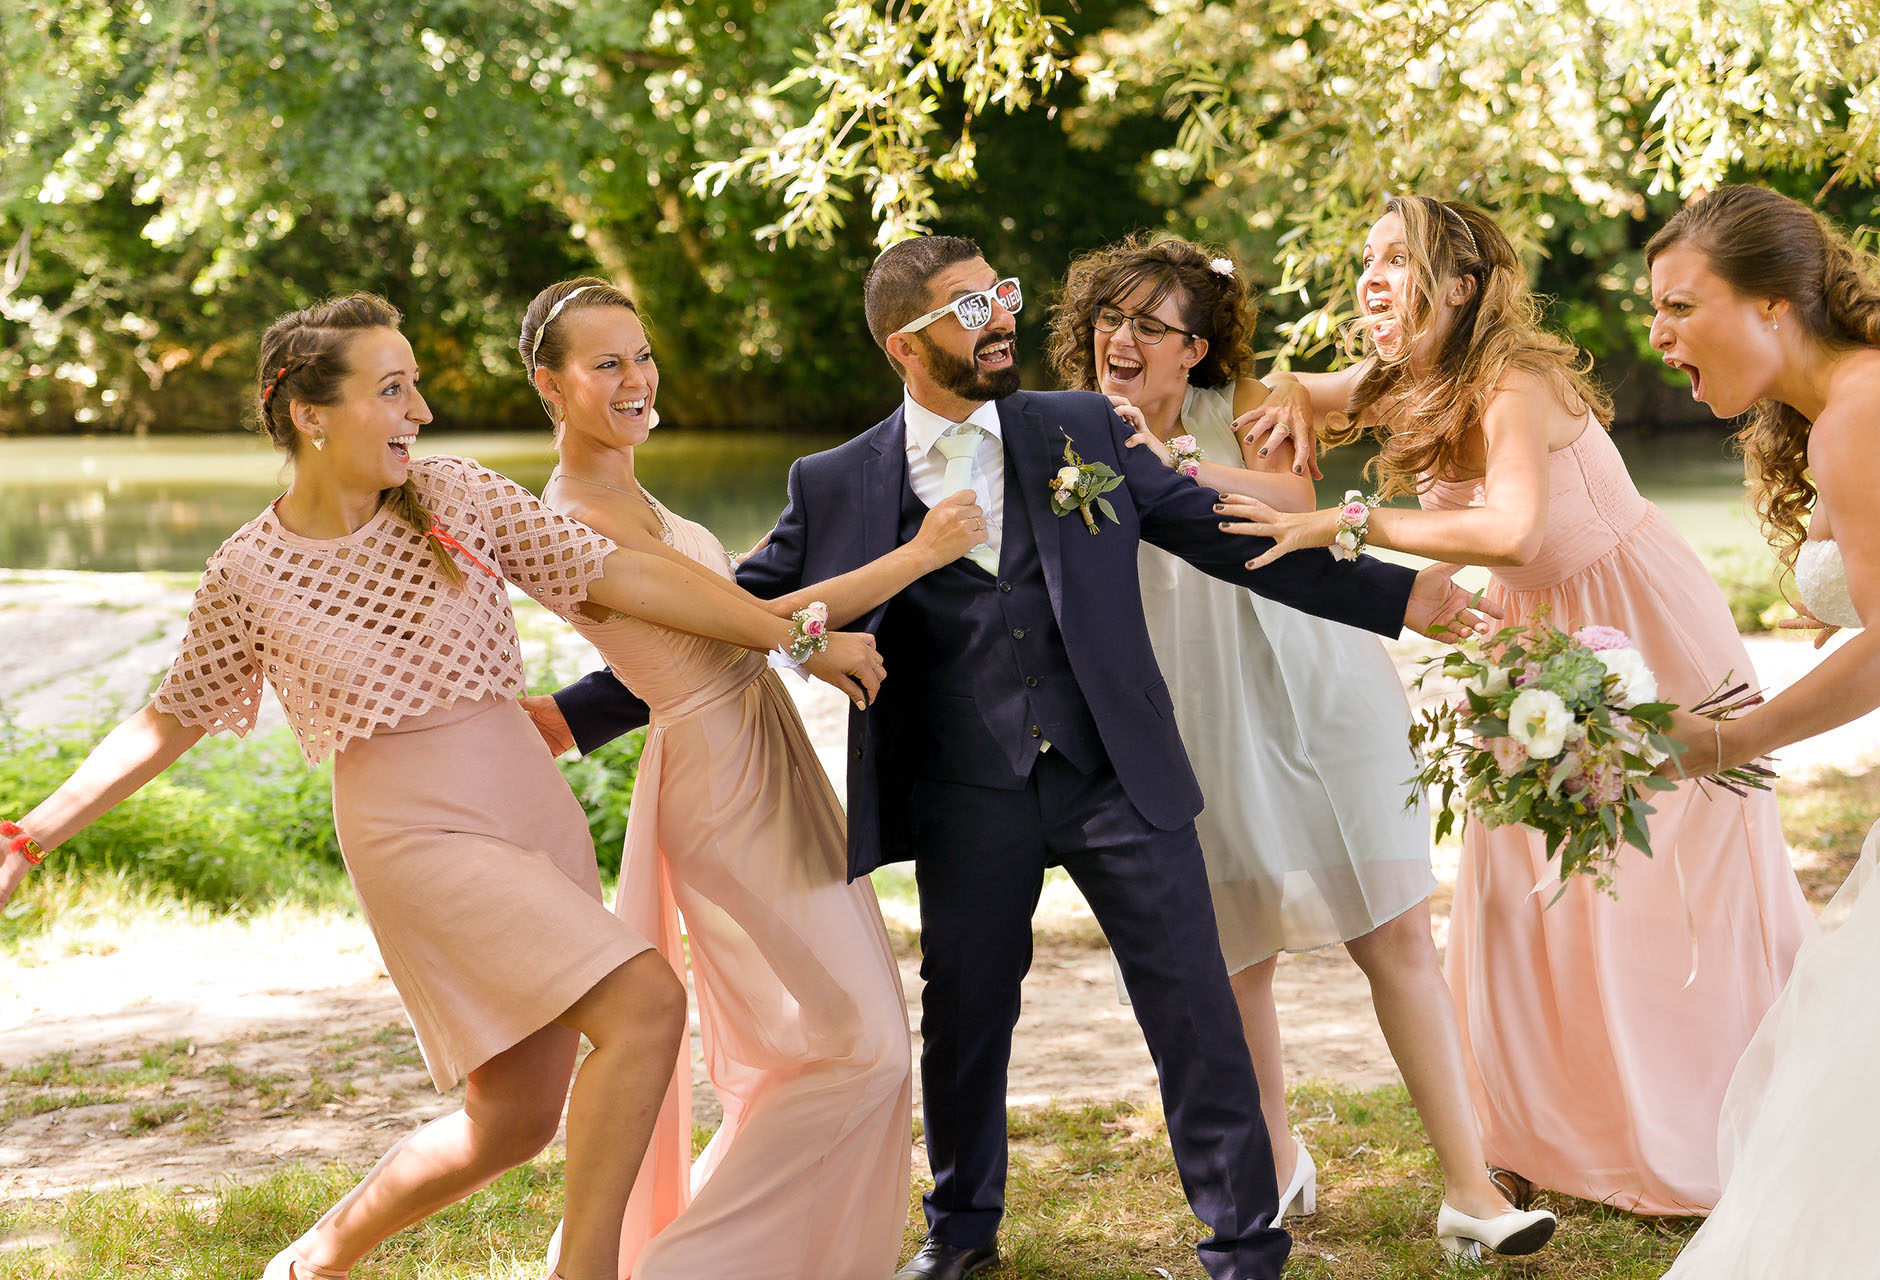 photographe-ile-de-france-mariage-maya-angelsen-fanny-pierre-gabriel-val-de-marne